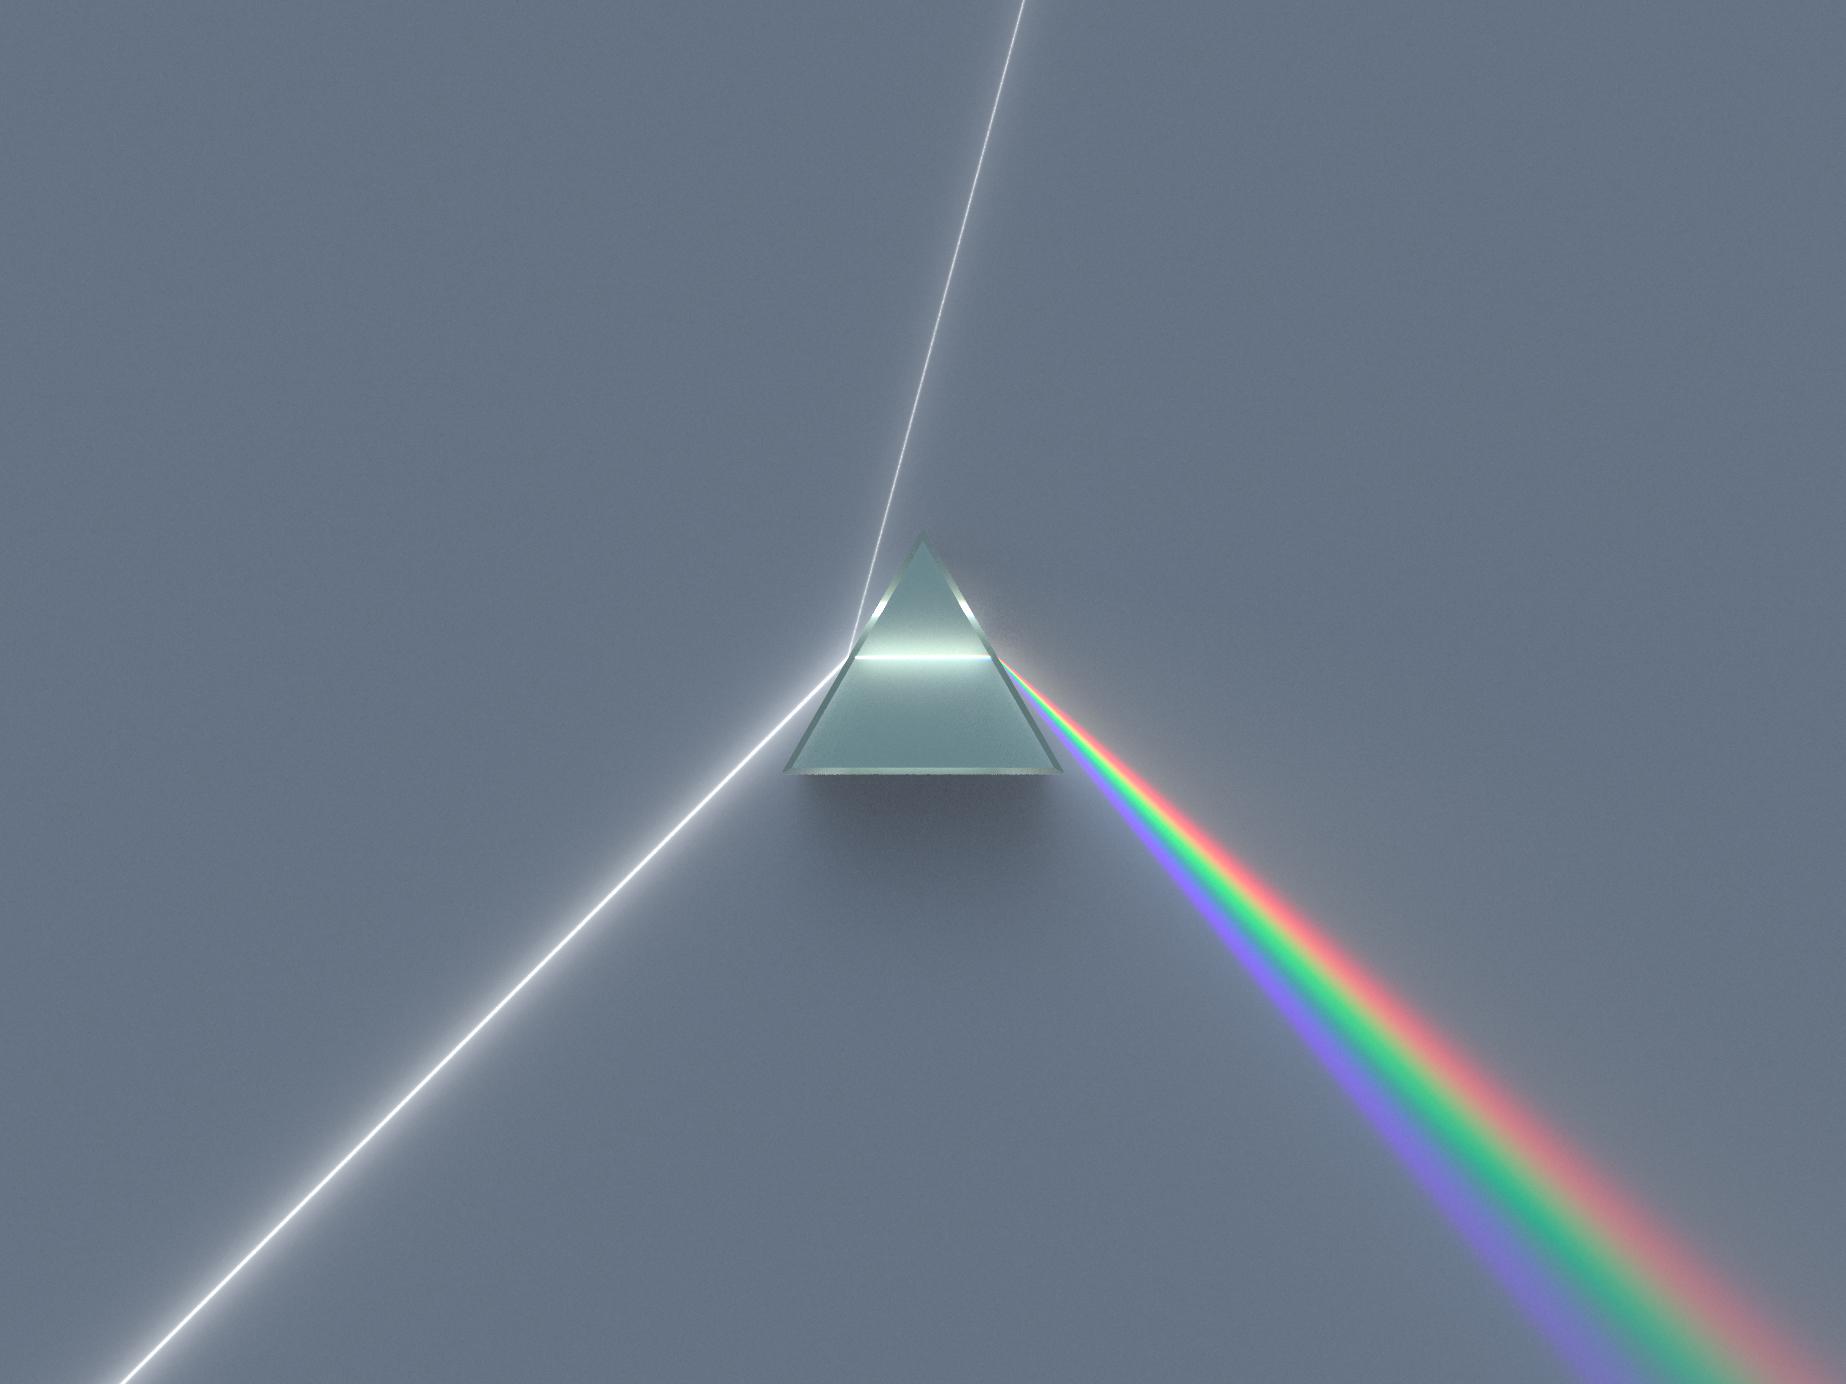 Классическая оптика - Оптика 5d2cdf9387351